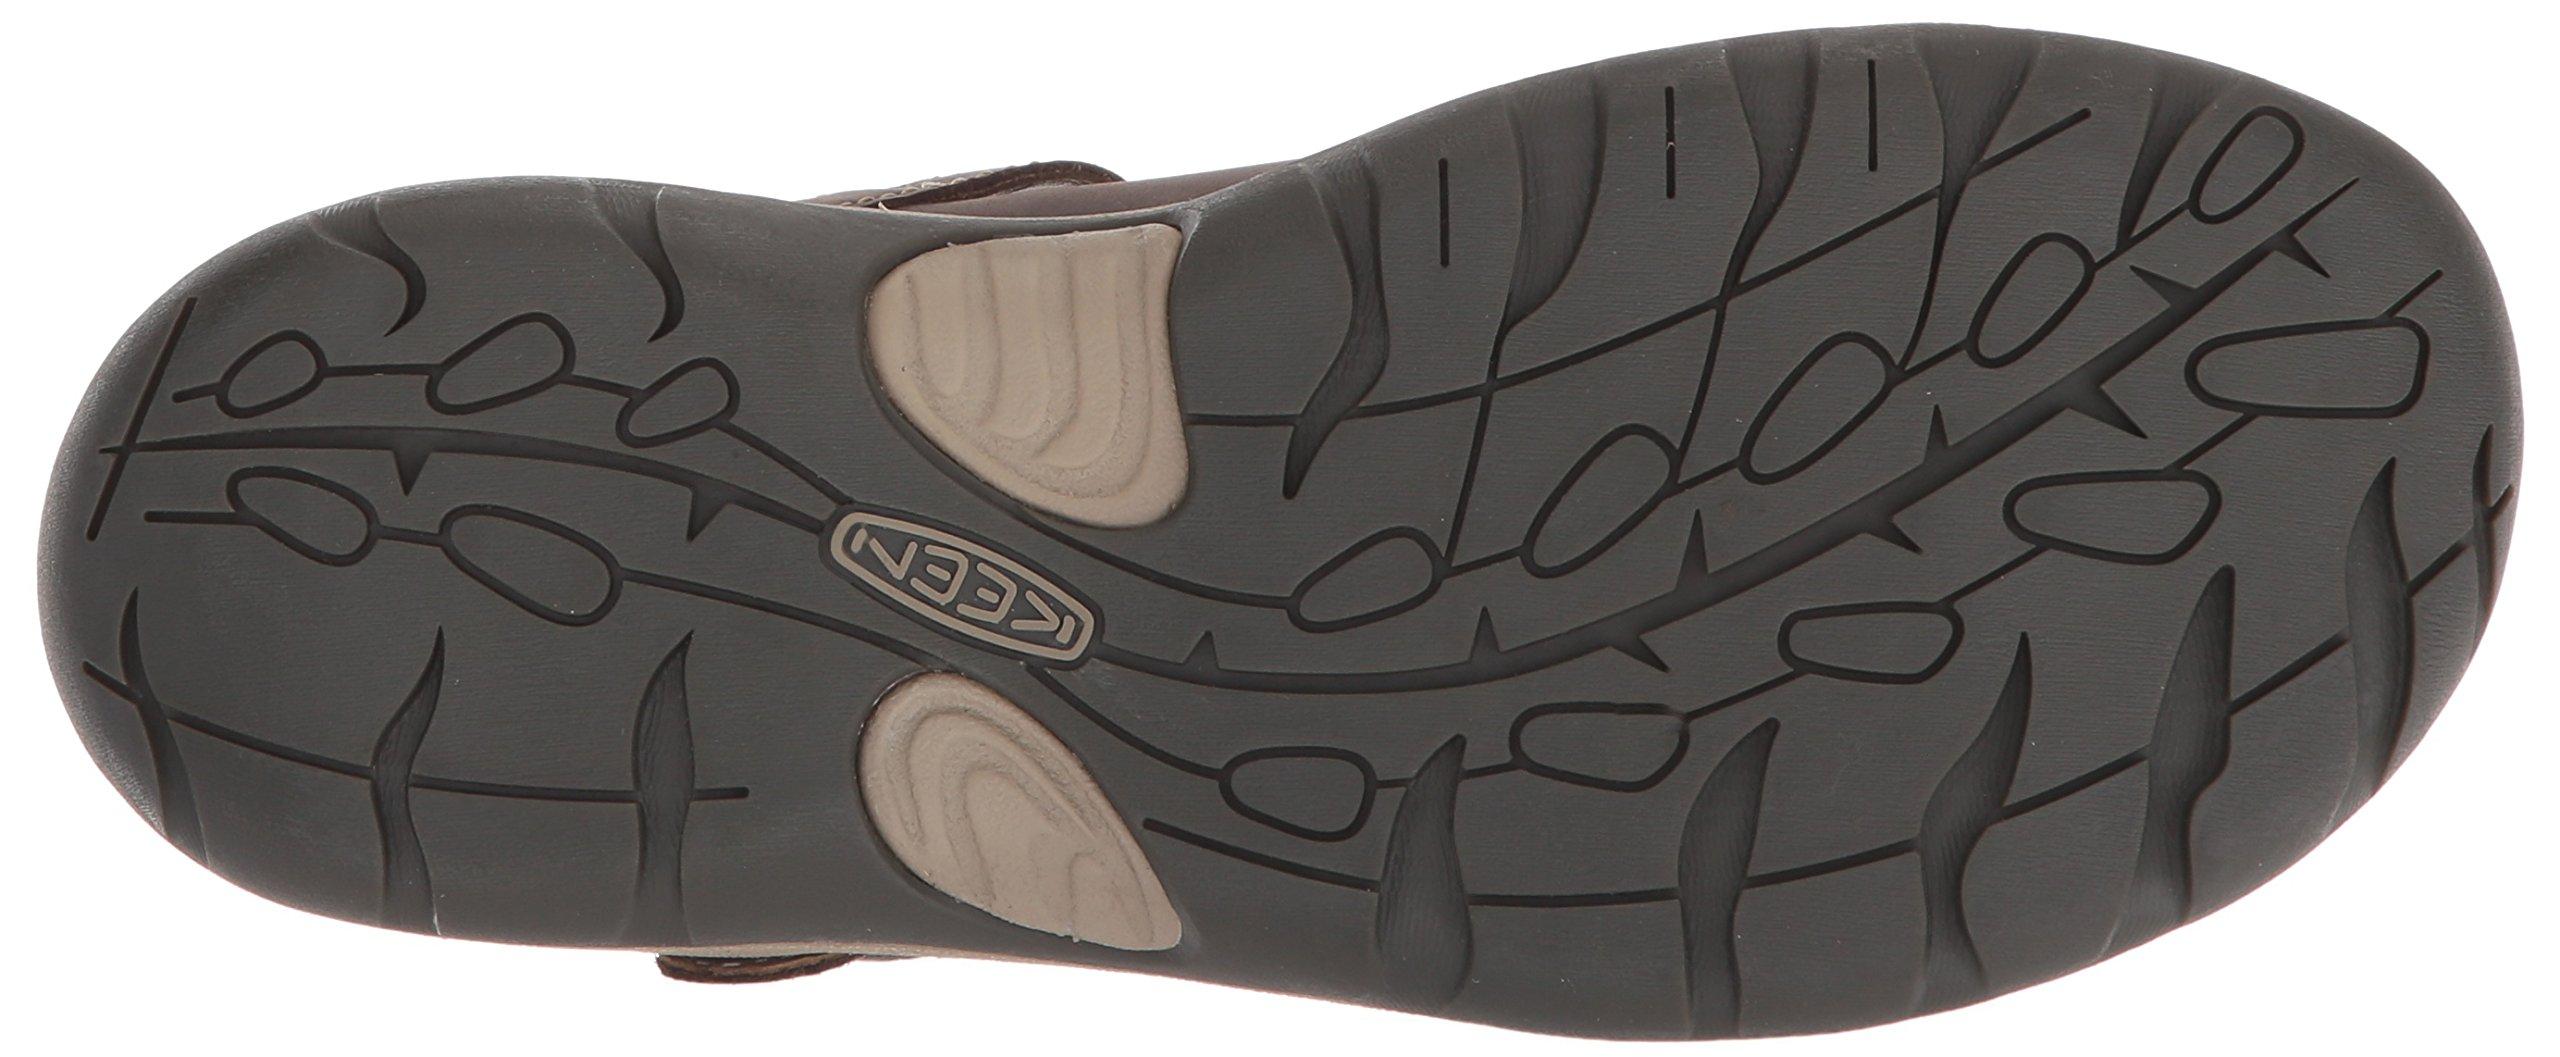 KEEN Women's Presidio II MJ-W Hiking Shoe, Infield/Cornstalk, 8.5 M US 3